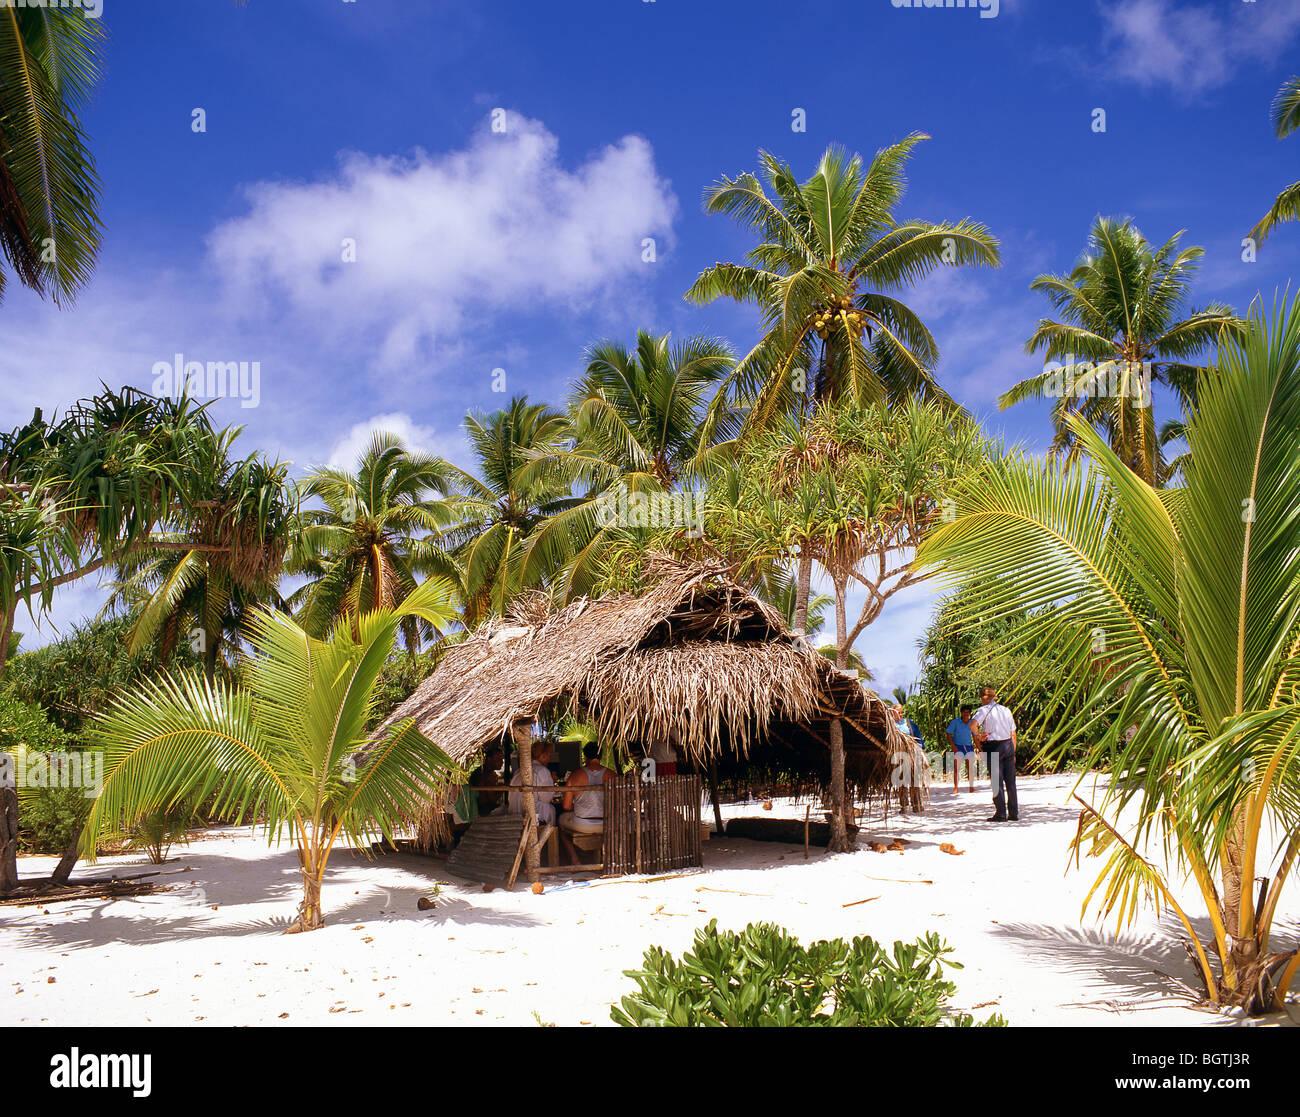 Best Beach Hut Holidays